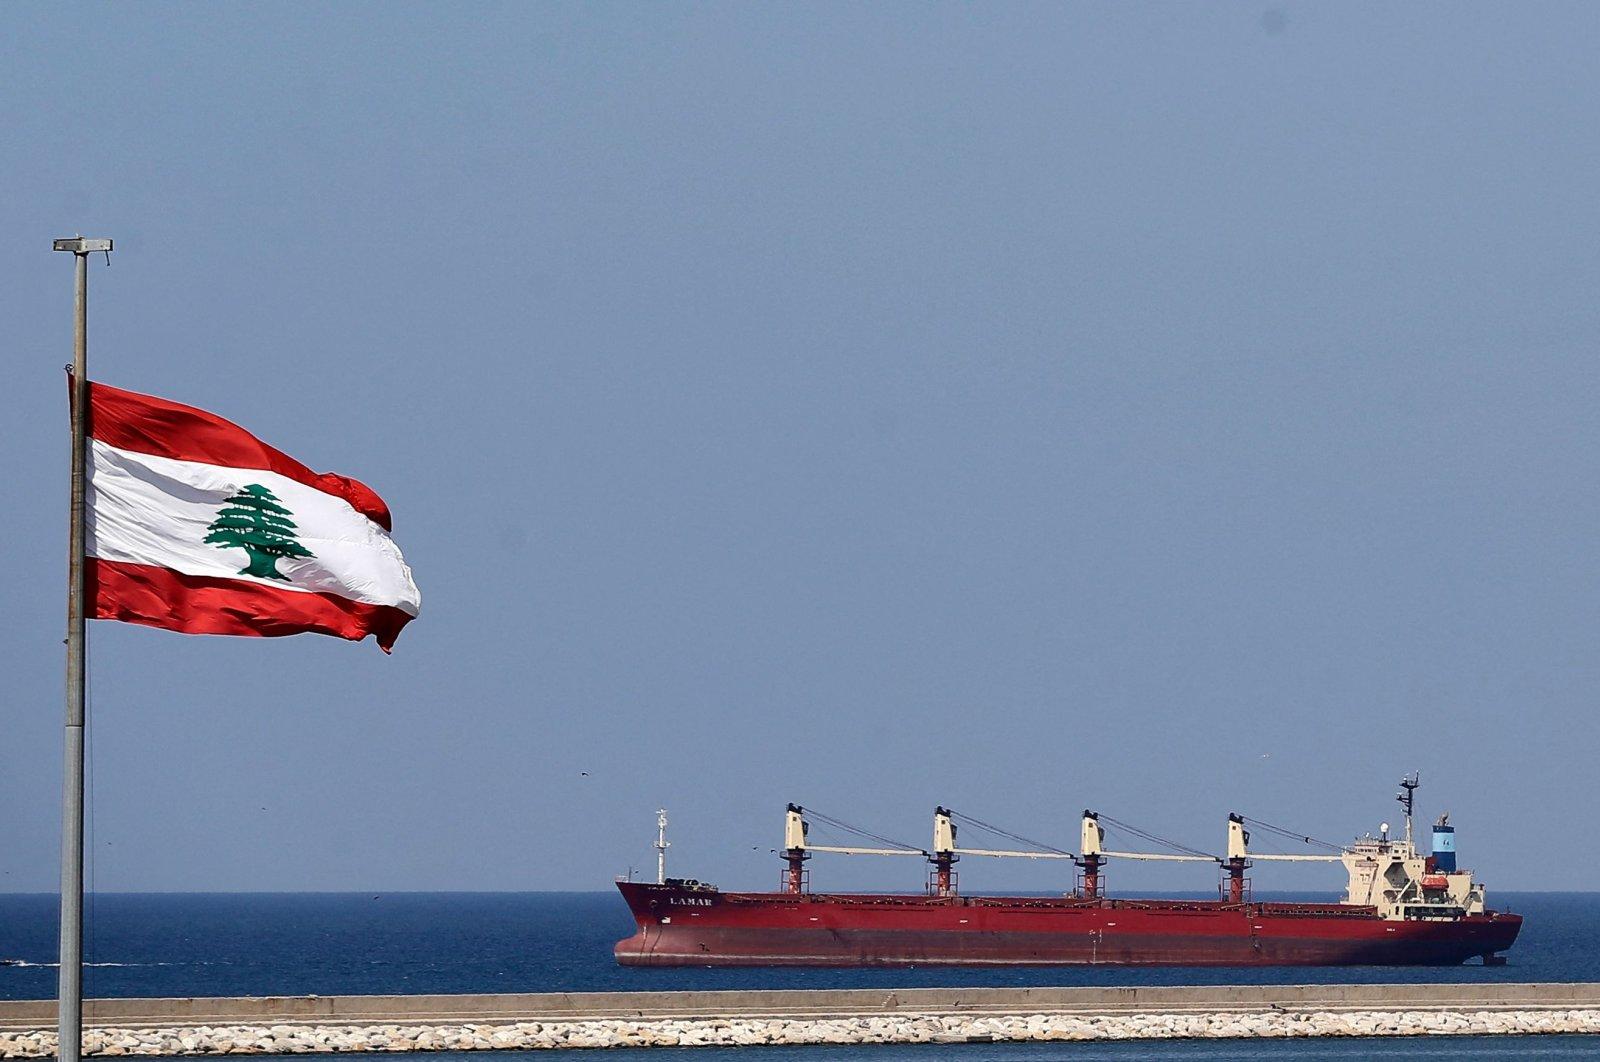 Bulk Carrier LAMAR is seen off the coast of Lebanon's capital Beirut, Sept. 14, 2021. (AFP Photo)